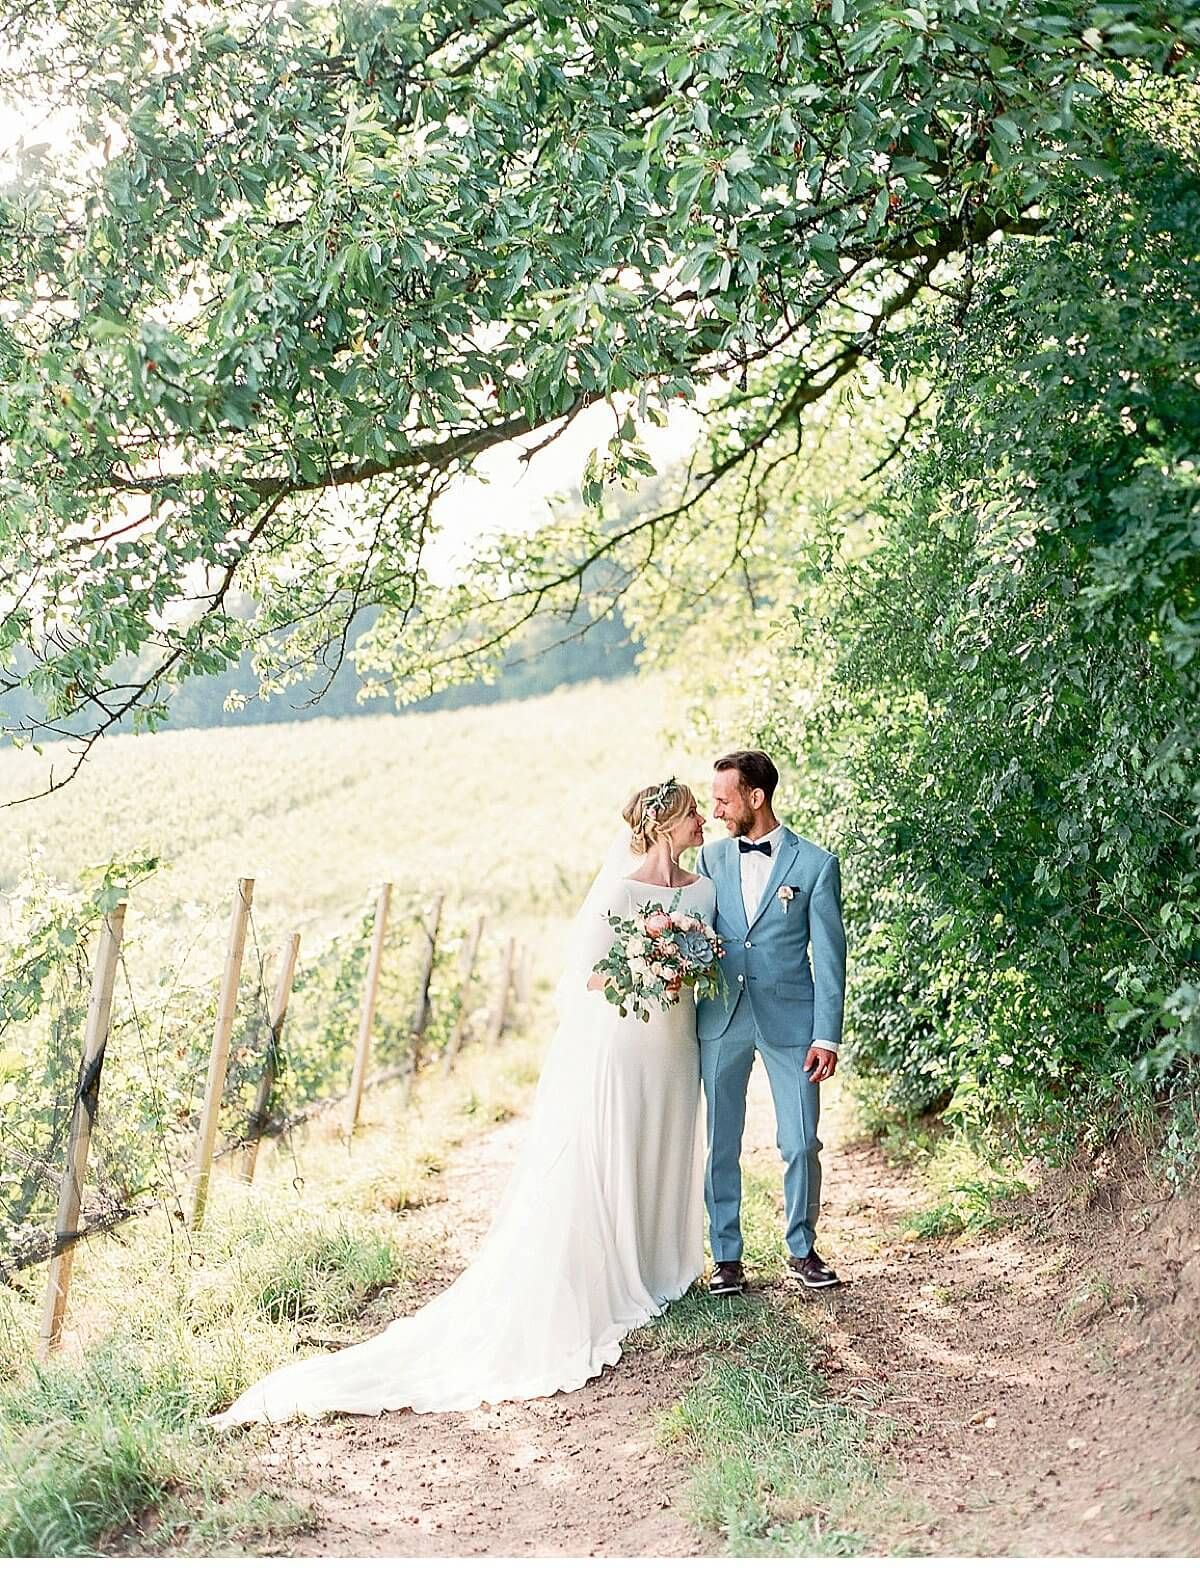 Vineyard Summer Wedding By Melanie Nedelko Www Amberandmuse Com Summer Wedding Yard Wedding Outdoor Wedding